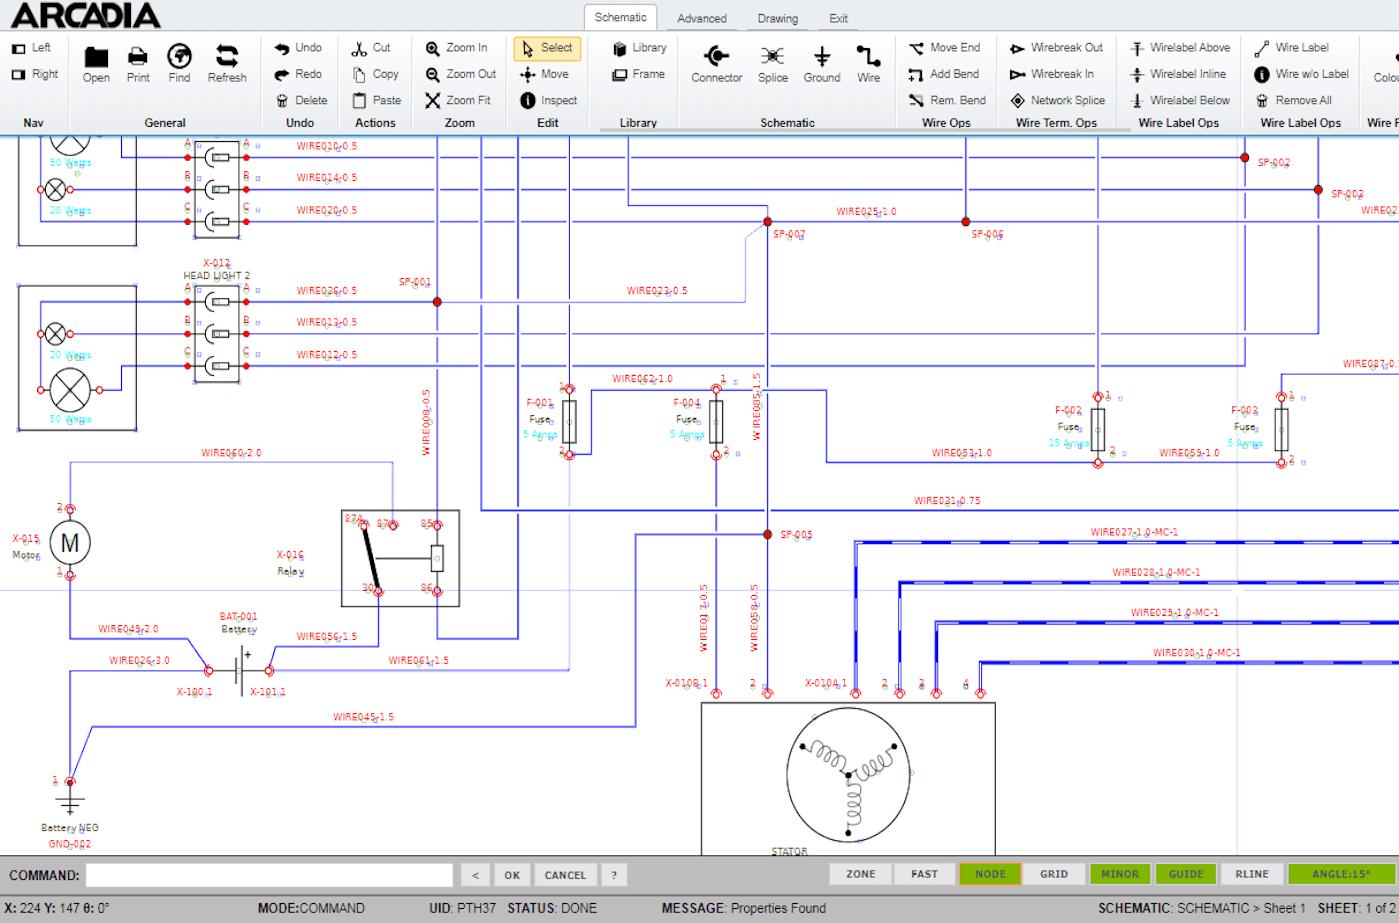 Arcadia Schematic - Electrical Design Software - Cadonix   Advanced Wiring Schematics      Cadonix